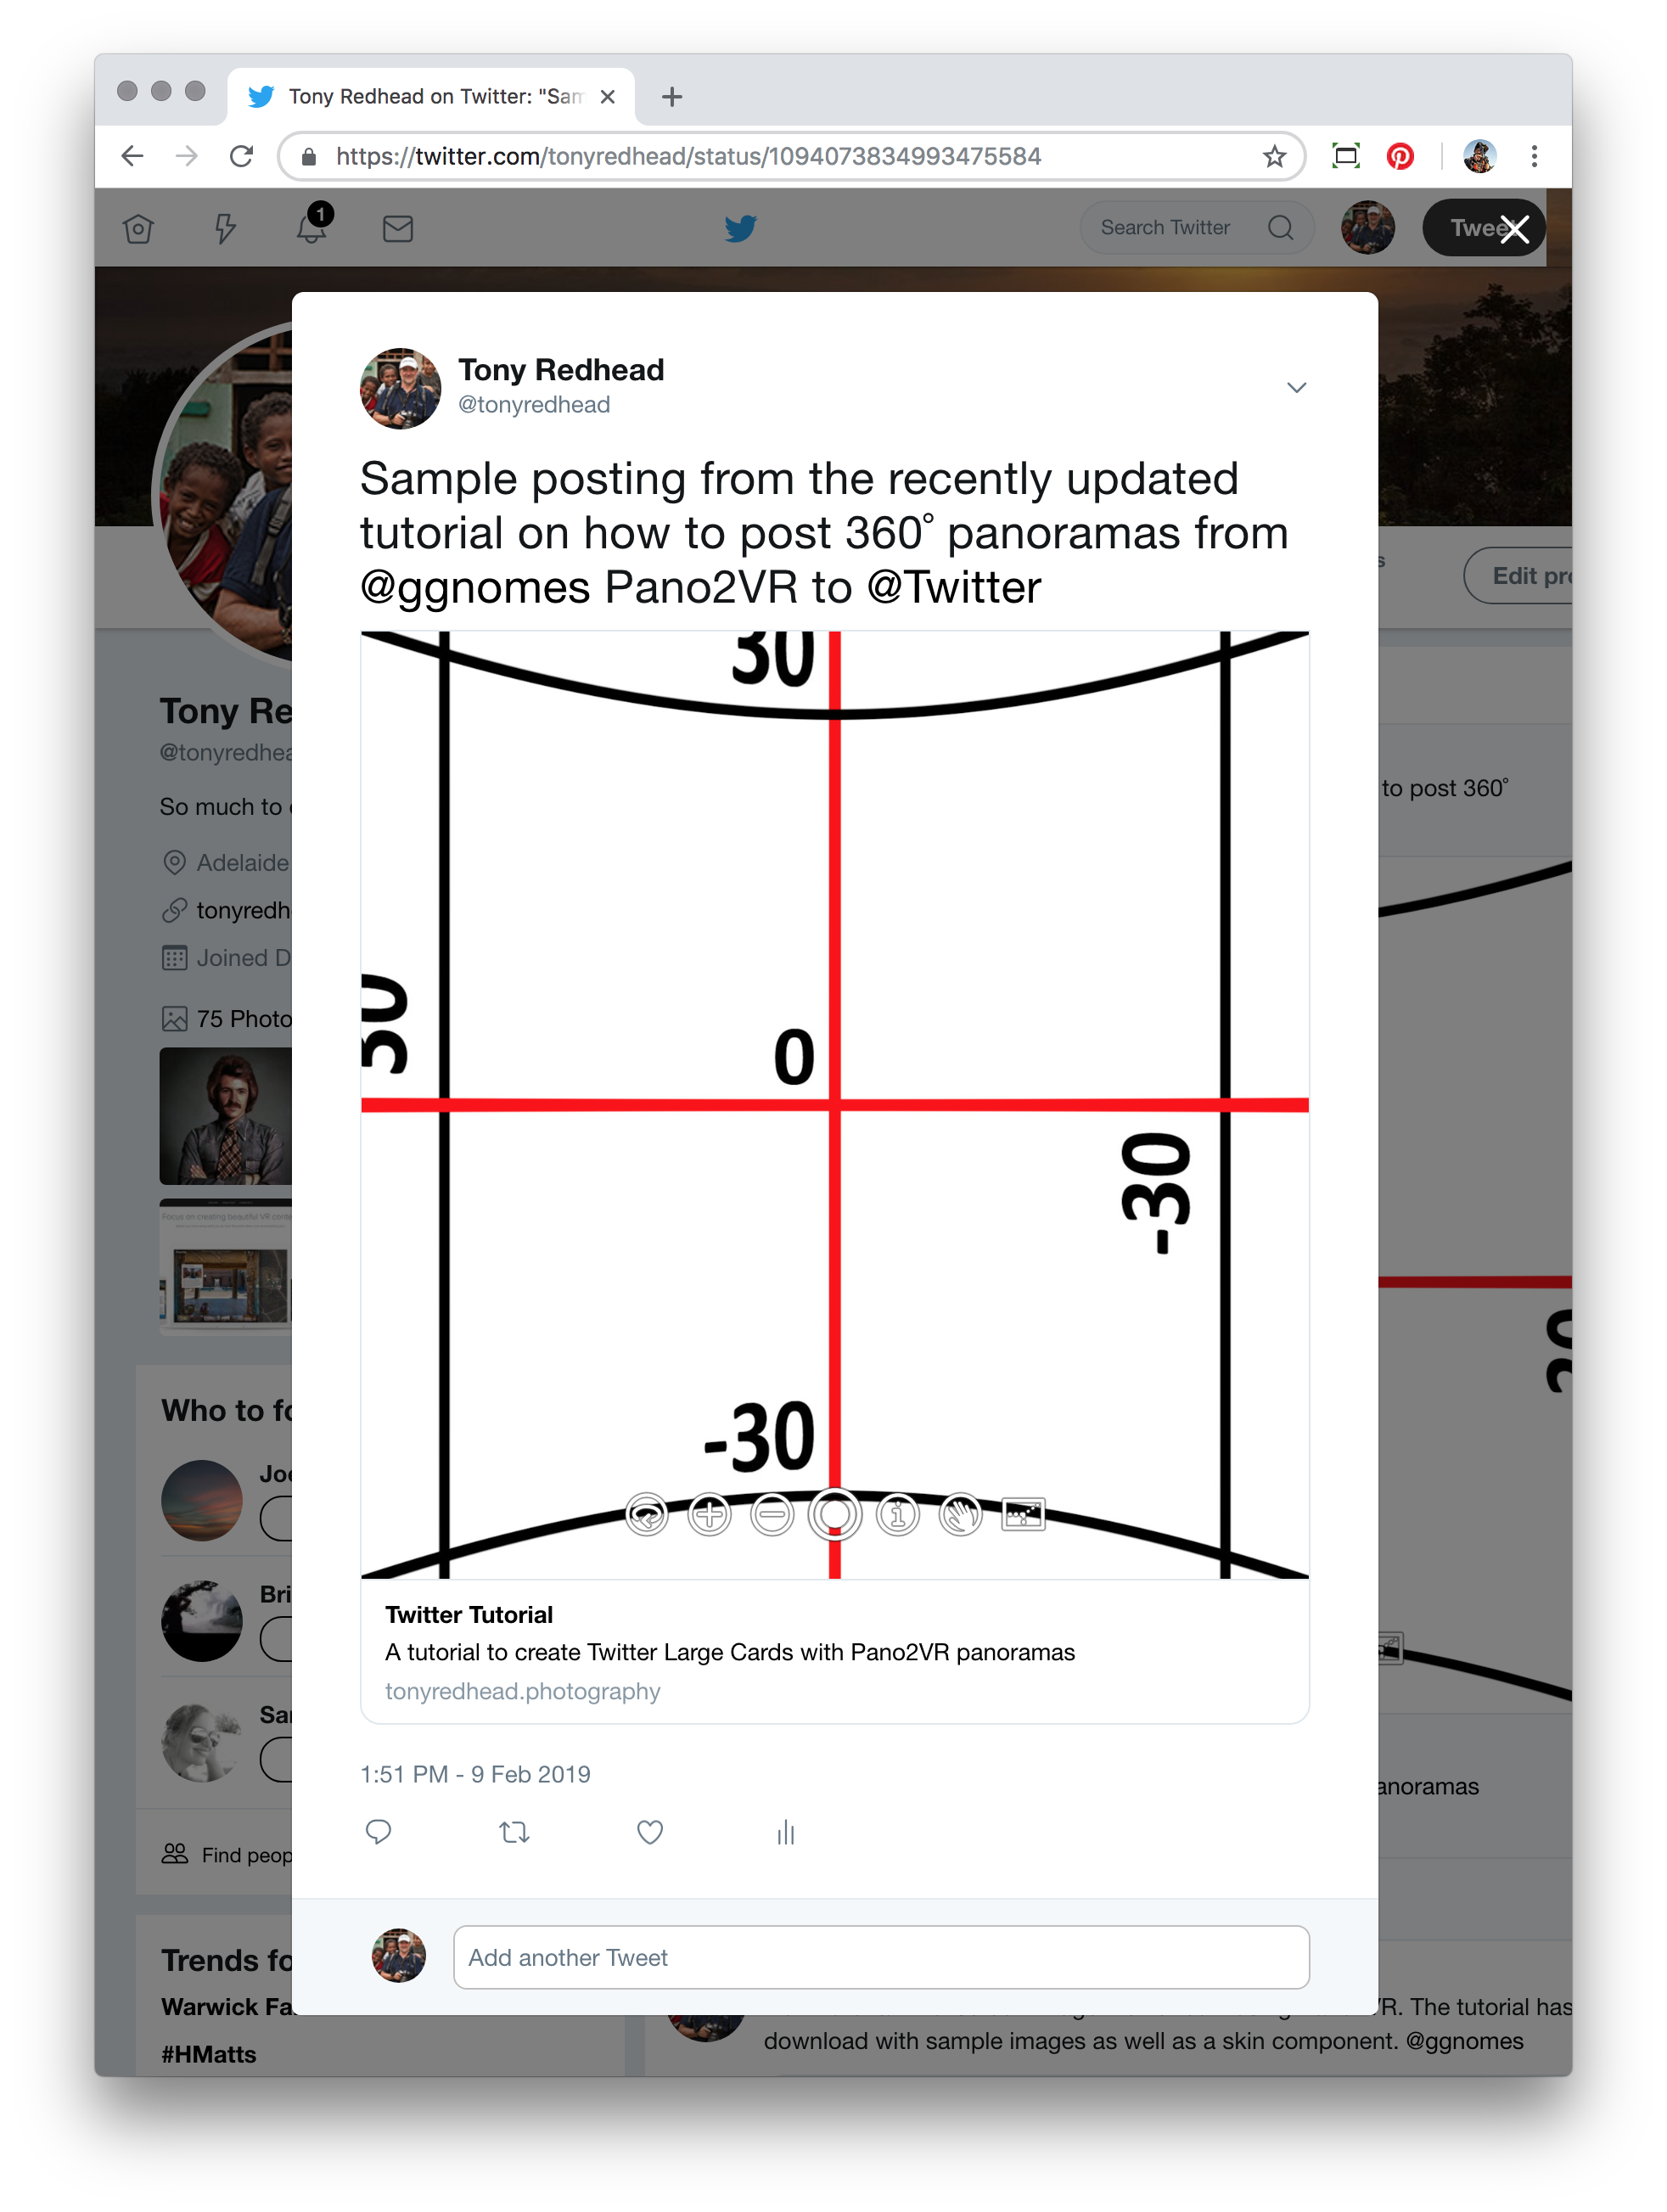 Expanded tweet showing the 360˚ panorama   https://twitter.com/tonyredhead/status/1094073834993475584